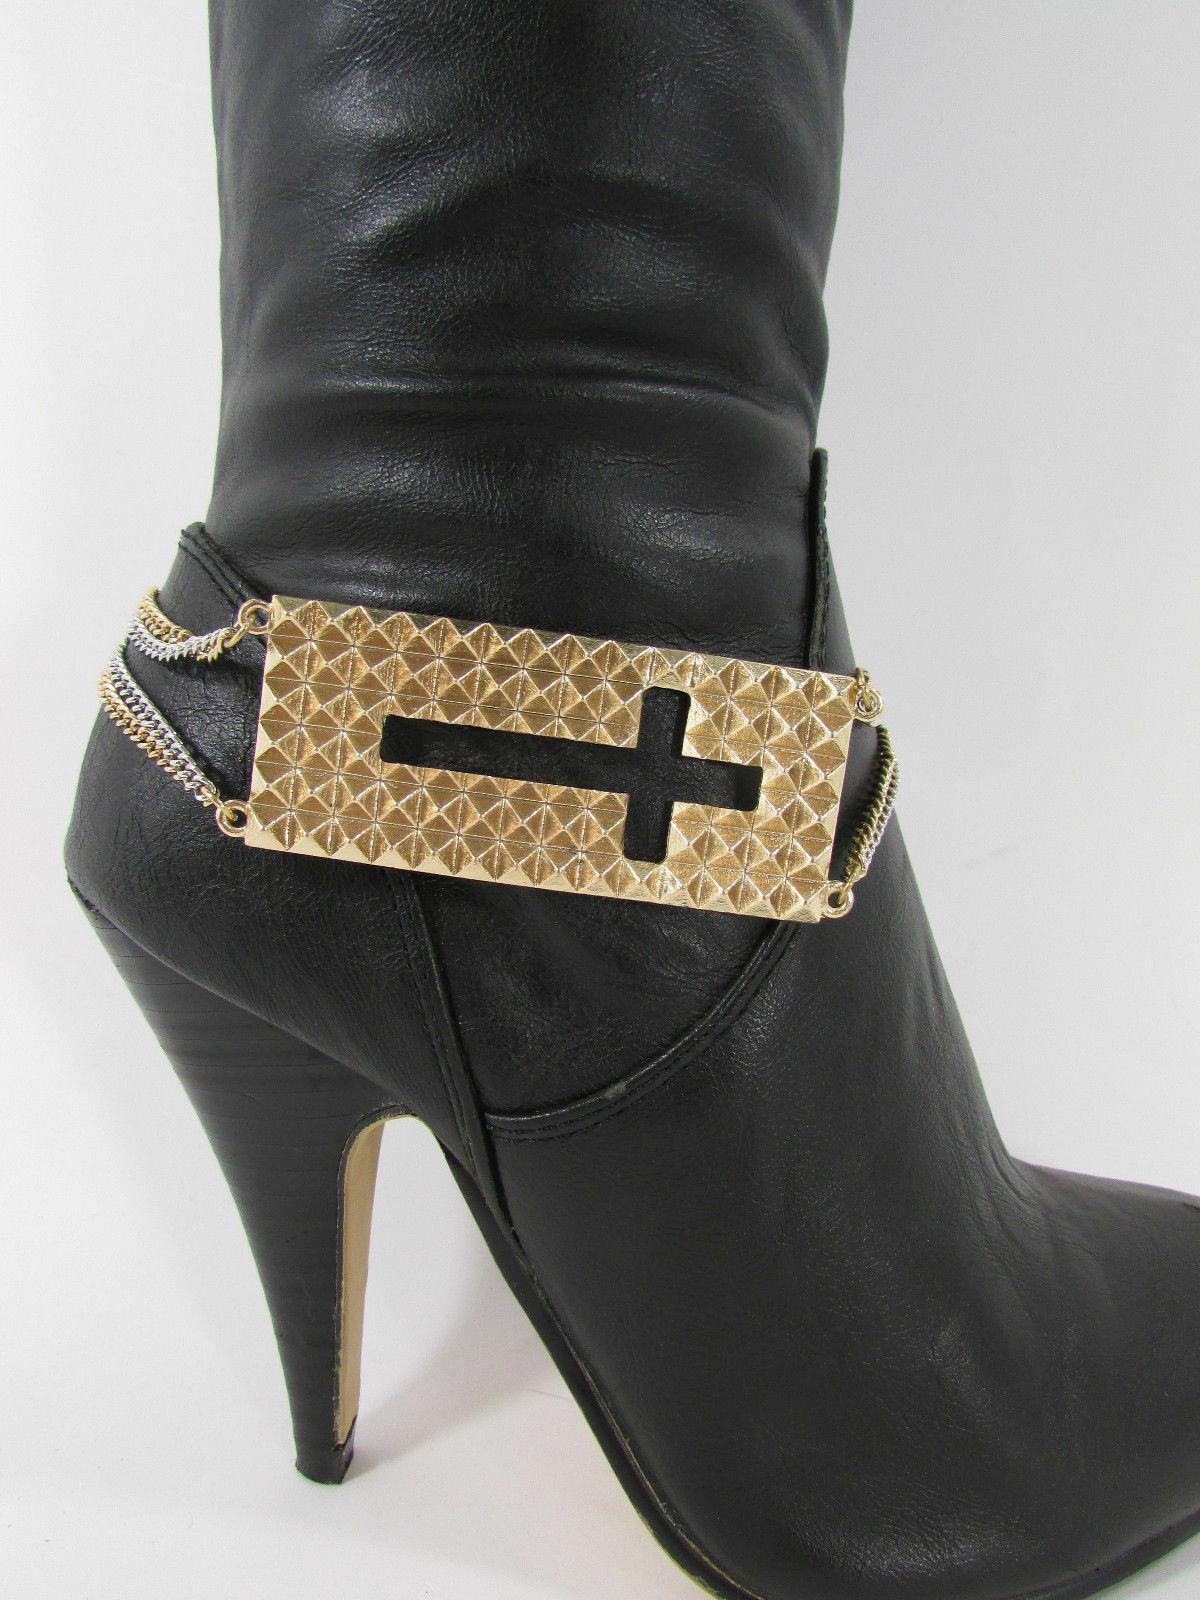 Mujer Moda Joyería Bota Brazalete Oro Placa Cruz Cadenas Zapato Bling Charm image 11